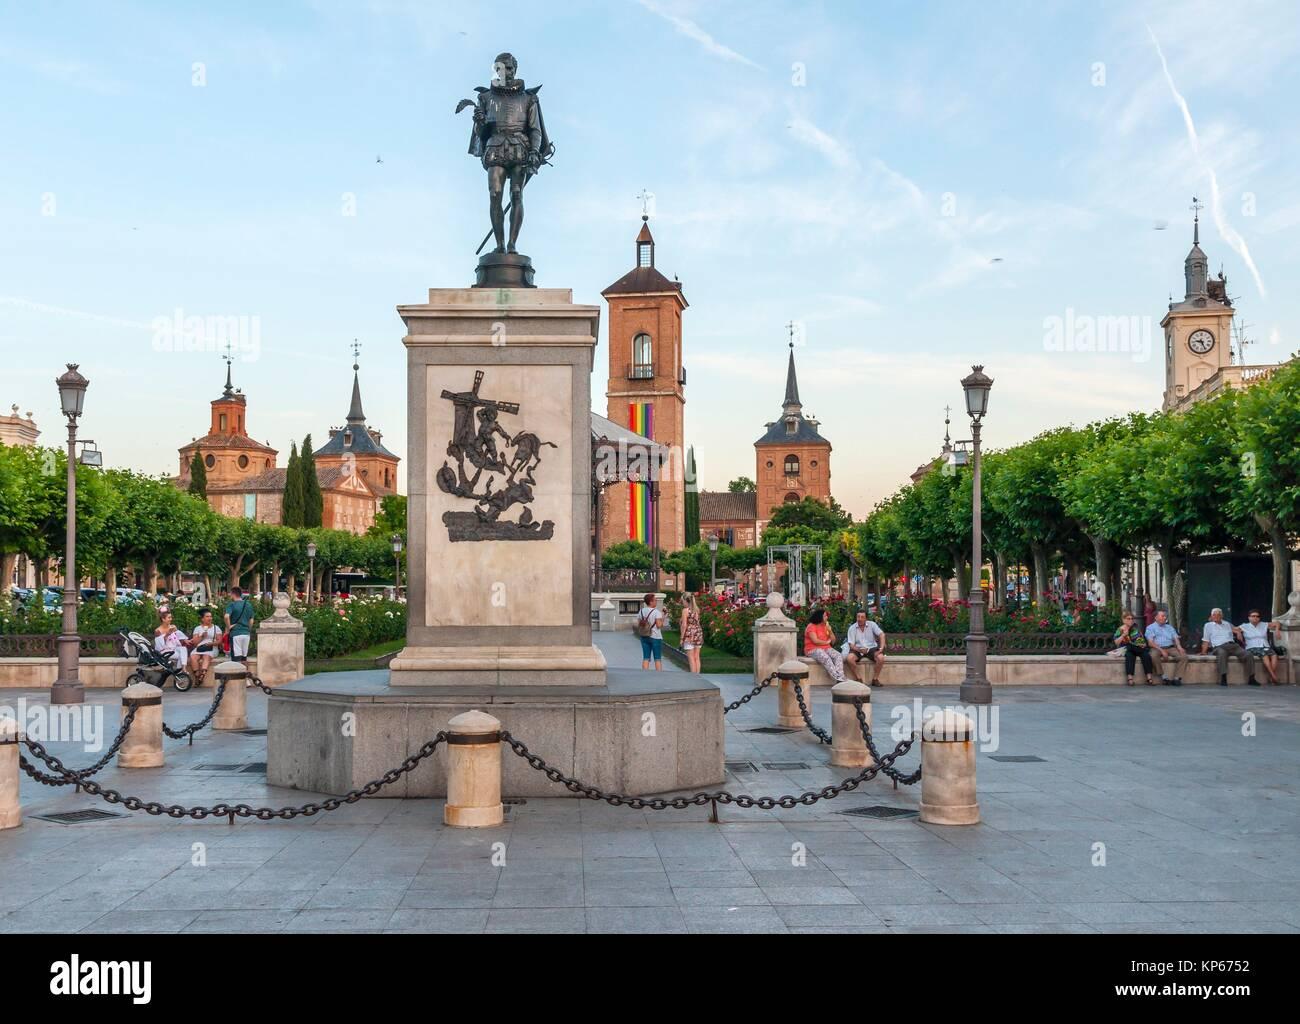 Plaza de Cervantes. Alcalá de Henares. Madrid. Spain. - Stock Image